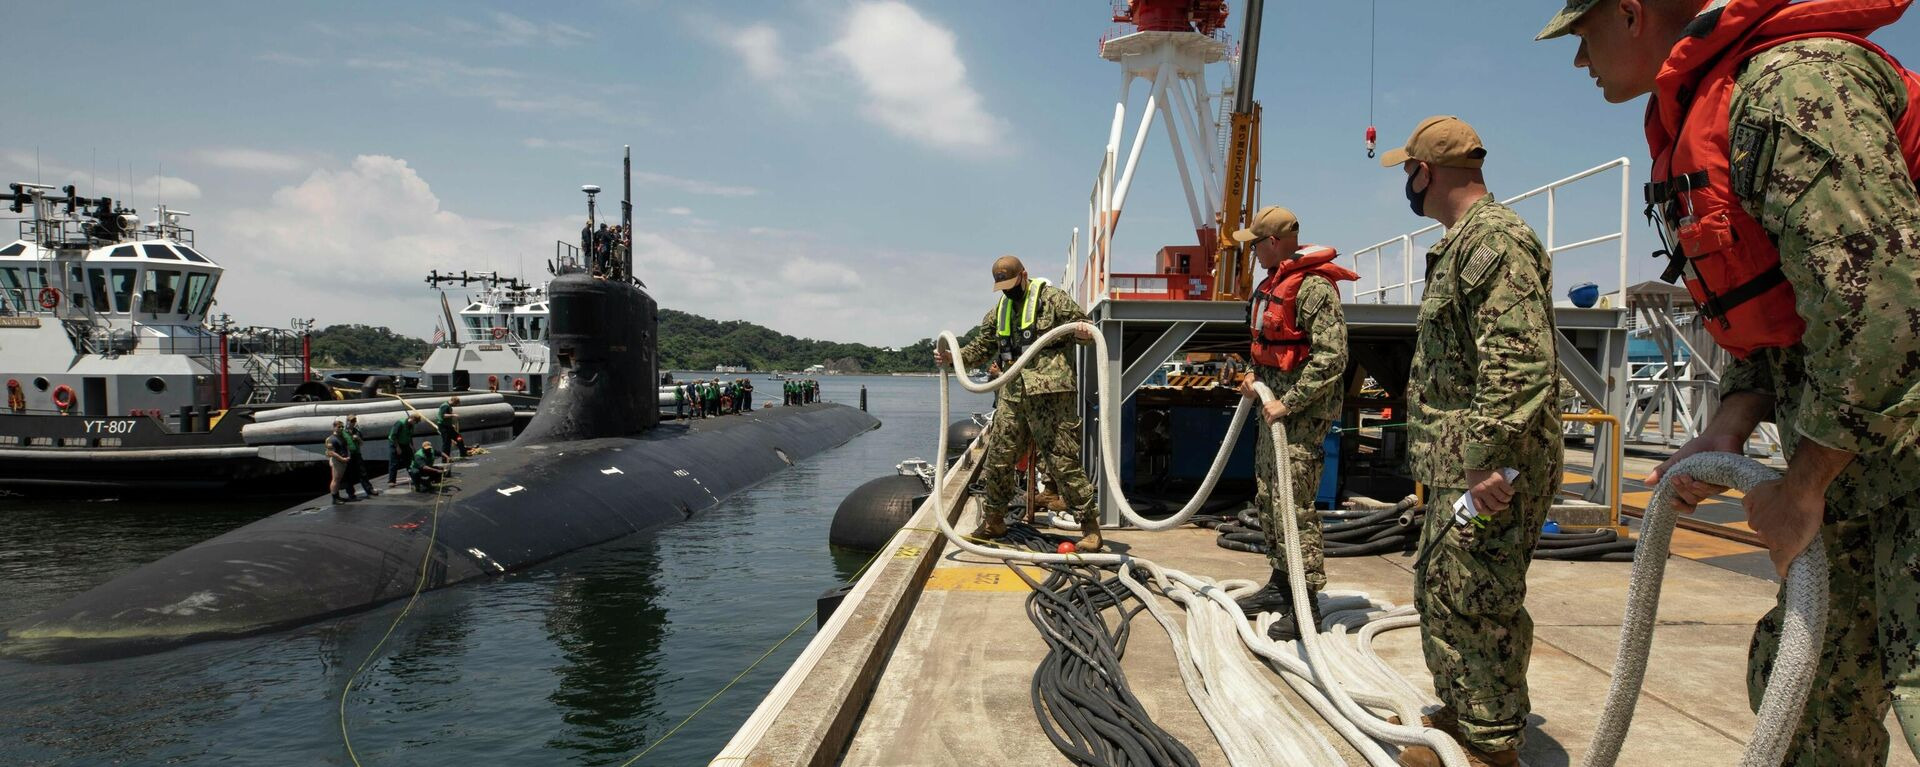 El submarino USS Connecticut (SSN 22) - Sputnik Mundo, 1920, 08.10.2021